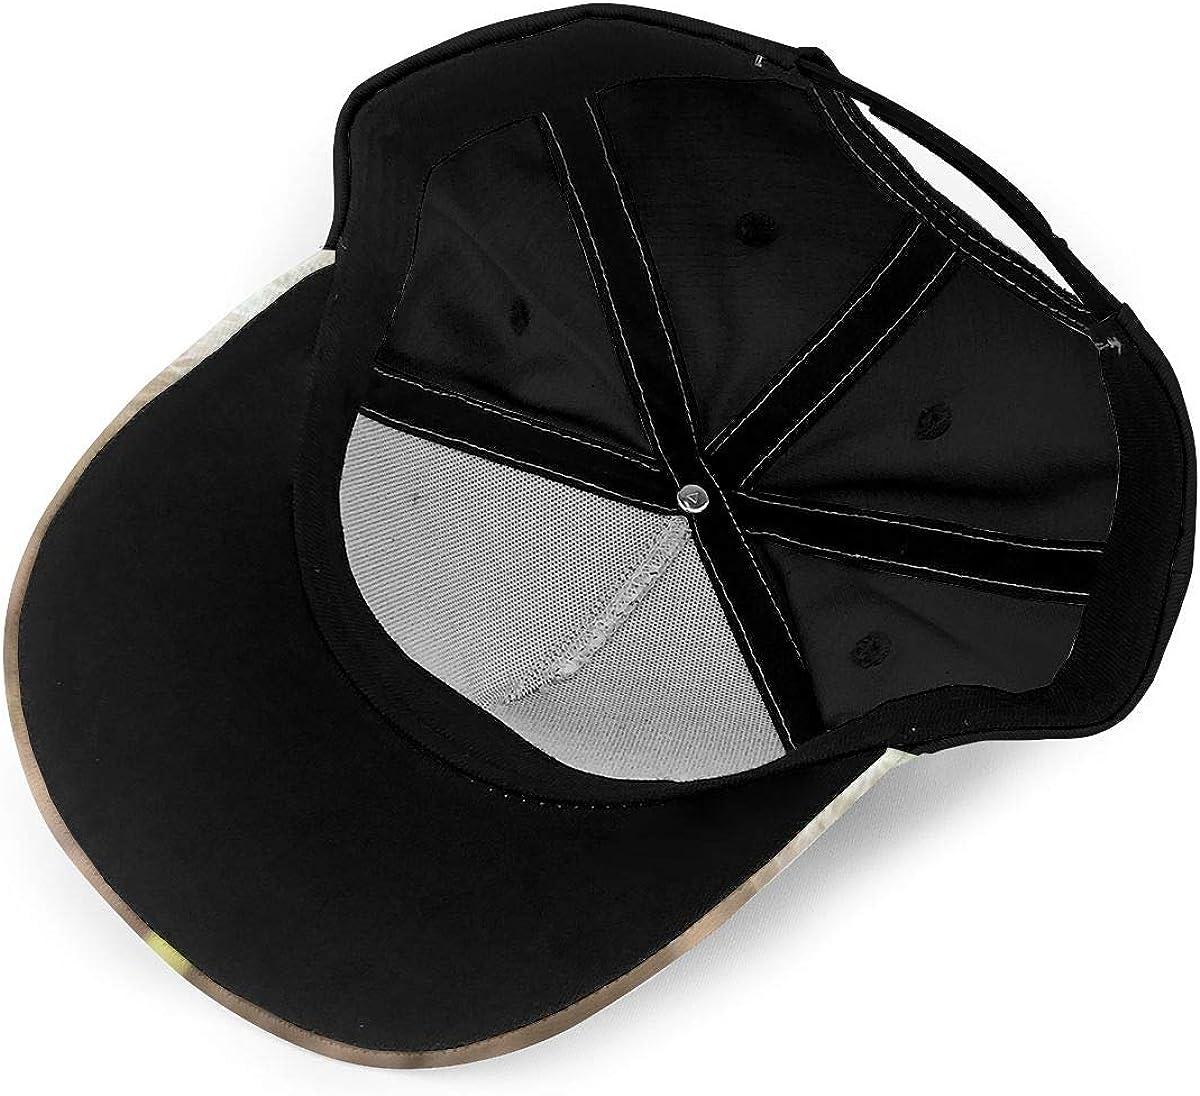 Dandelion Closeup Classic Baseball Cap Men Women Dad Hat Twill Adjustable Size Black